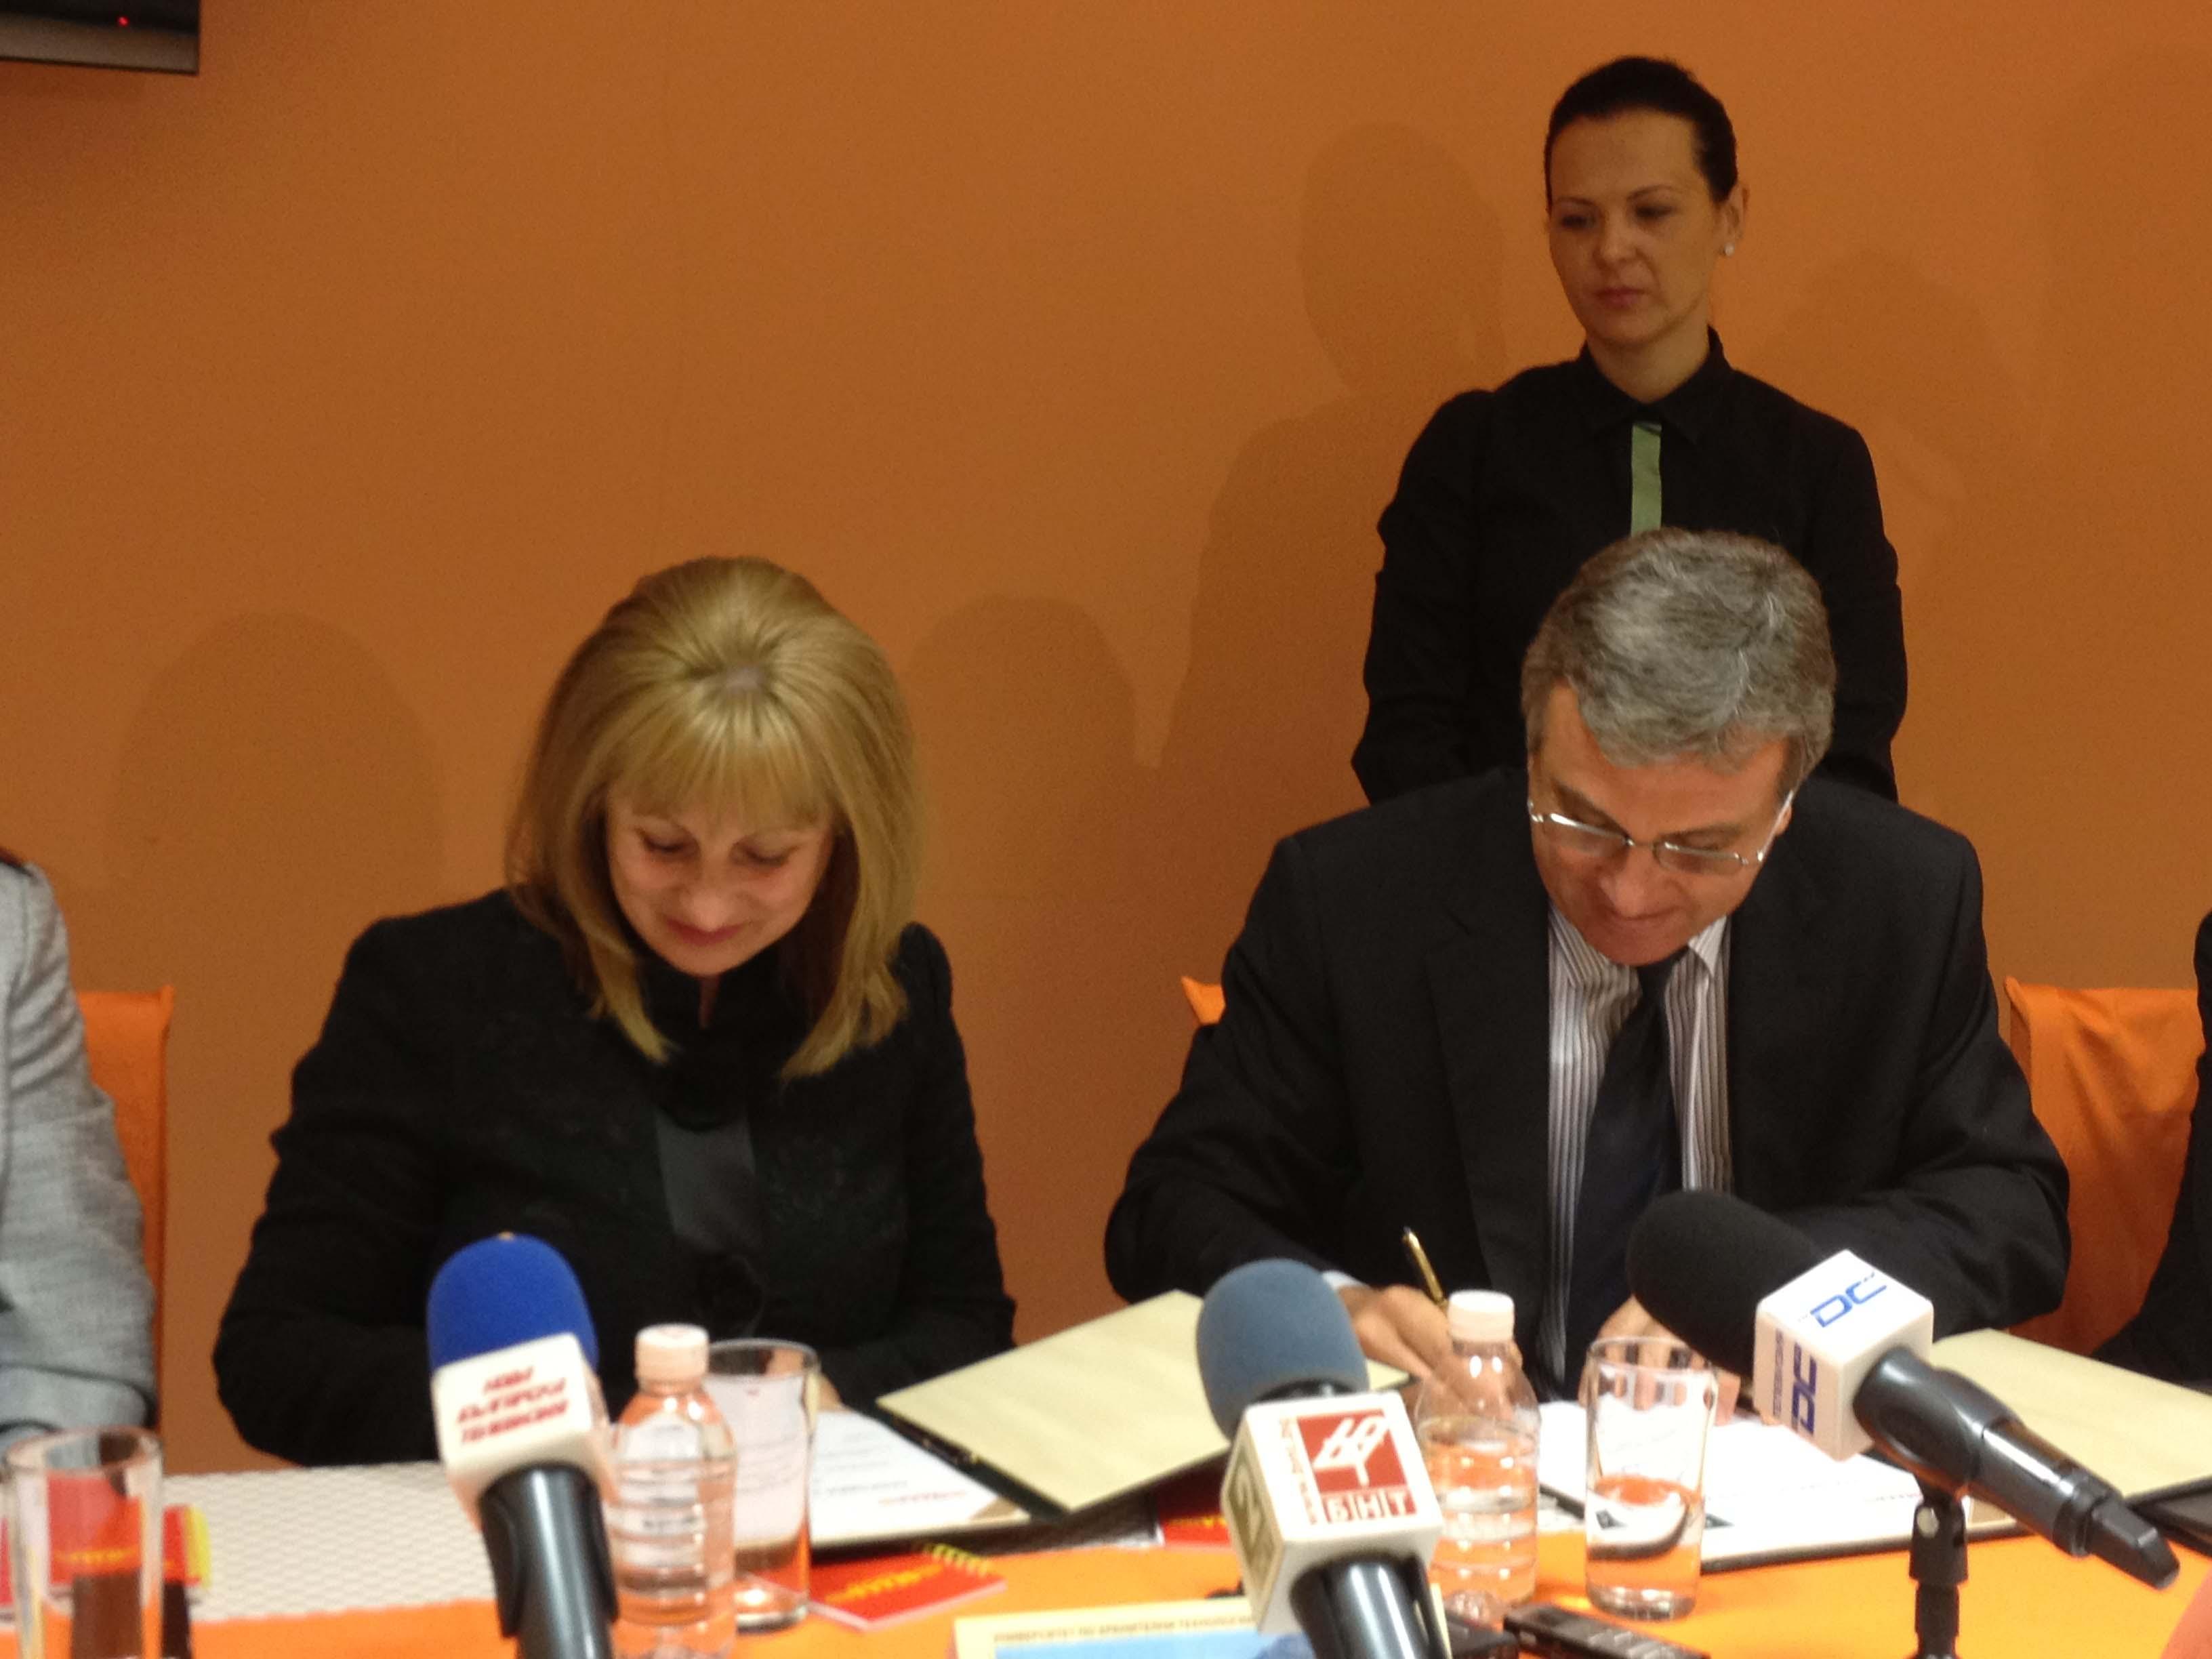 Bella, UHT Spogodba (2013)/ Bella, UFT Agreement for partnership (2013)